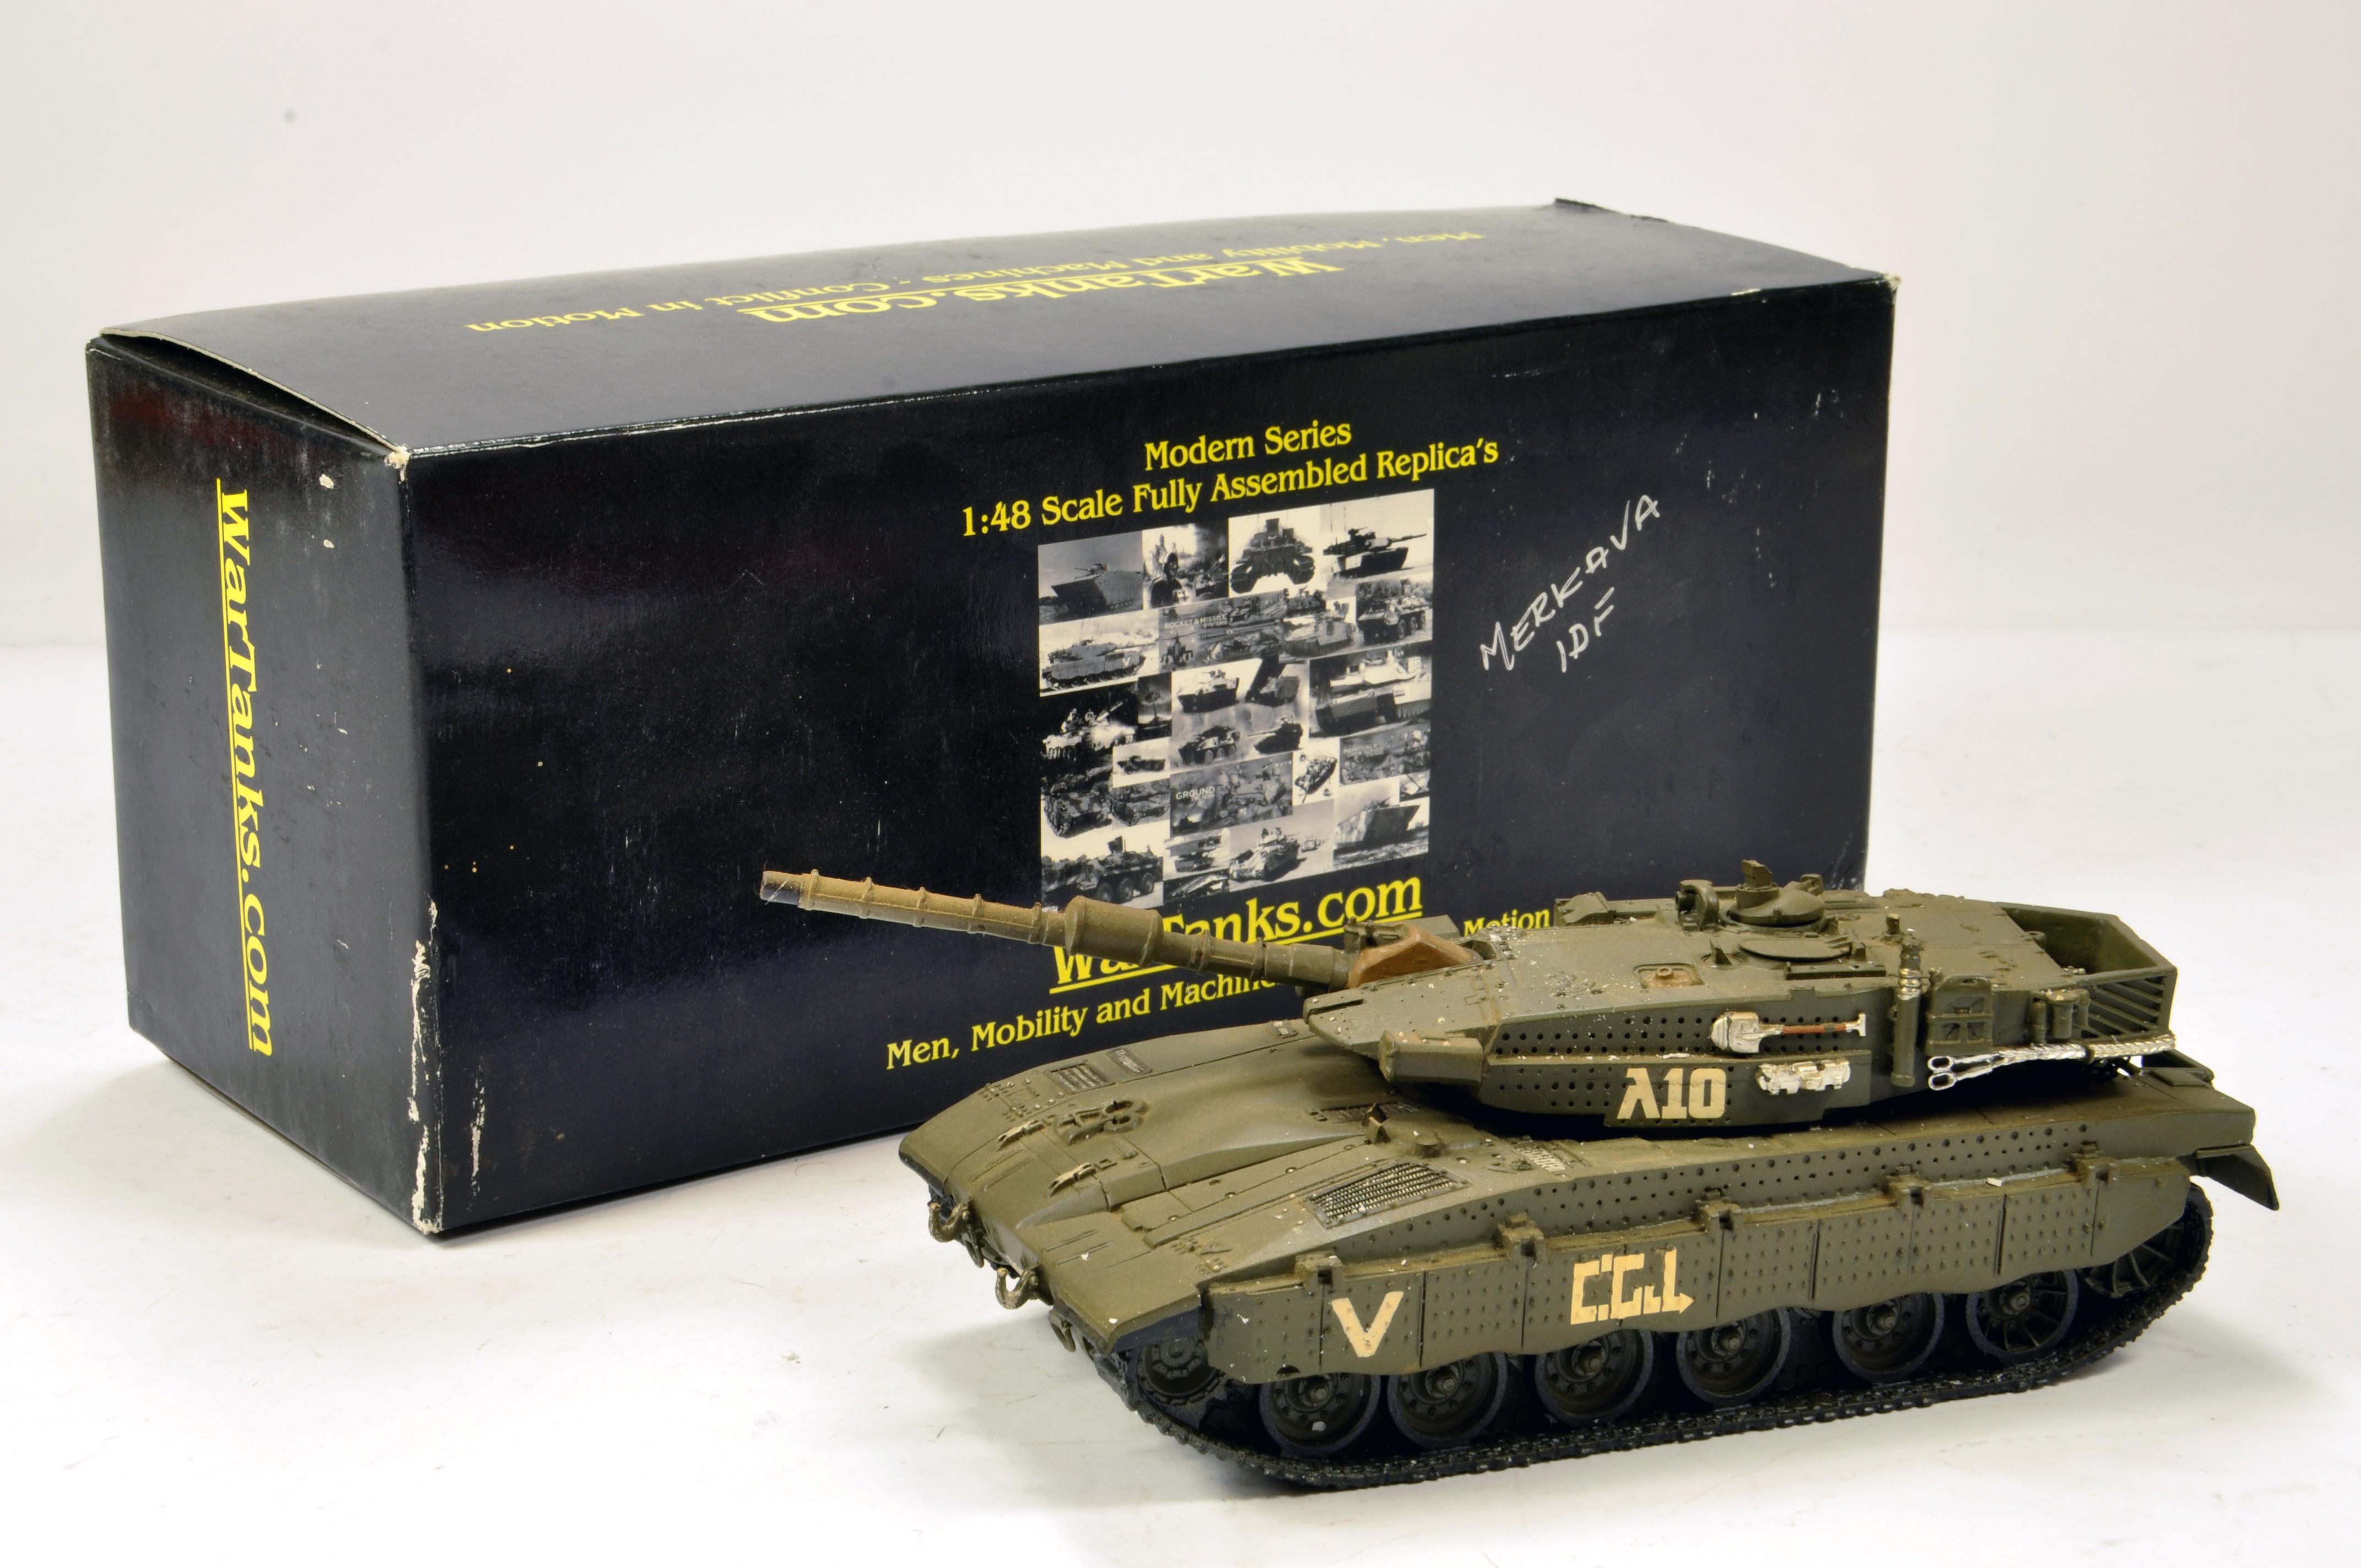 Lot 1096 - Wartanks.com 1/48 Resin White Metal issue comprising limited edition Merkava III Israeli Defence